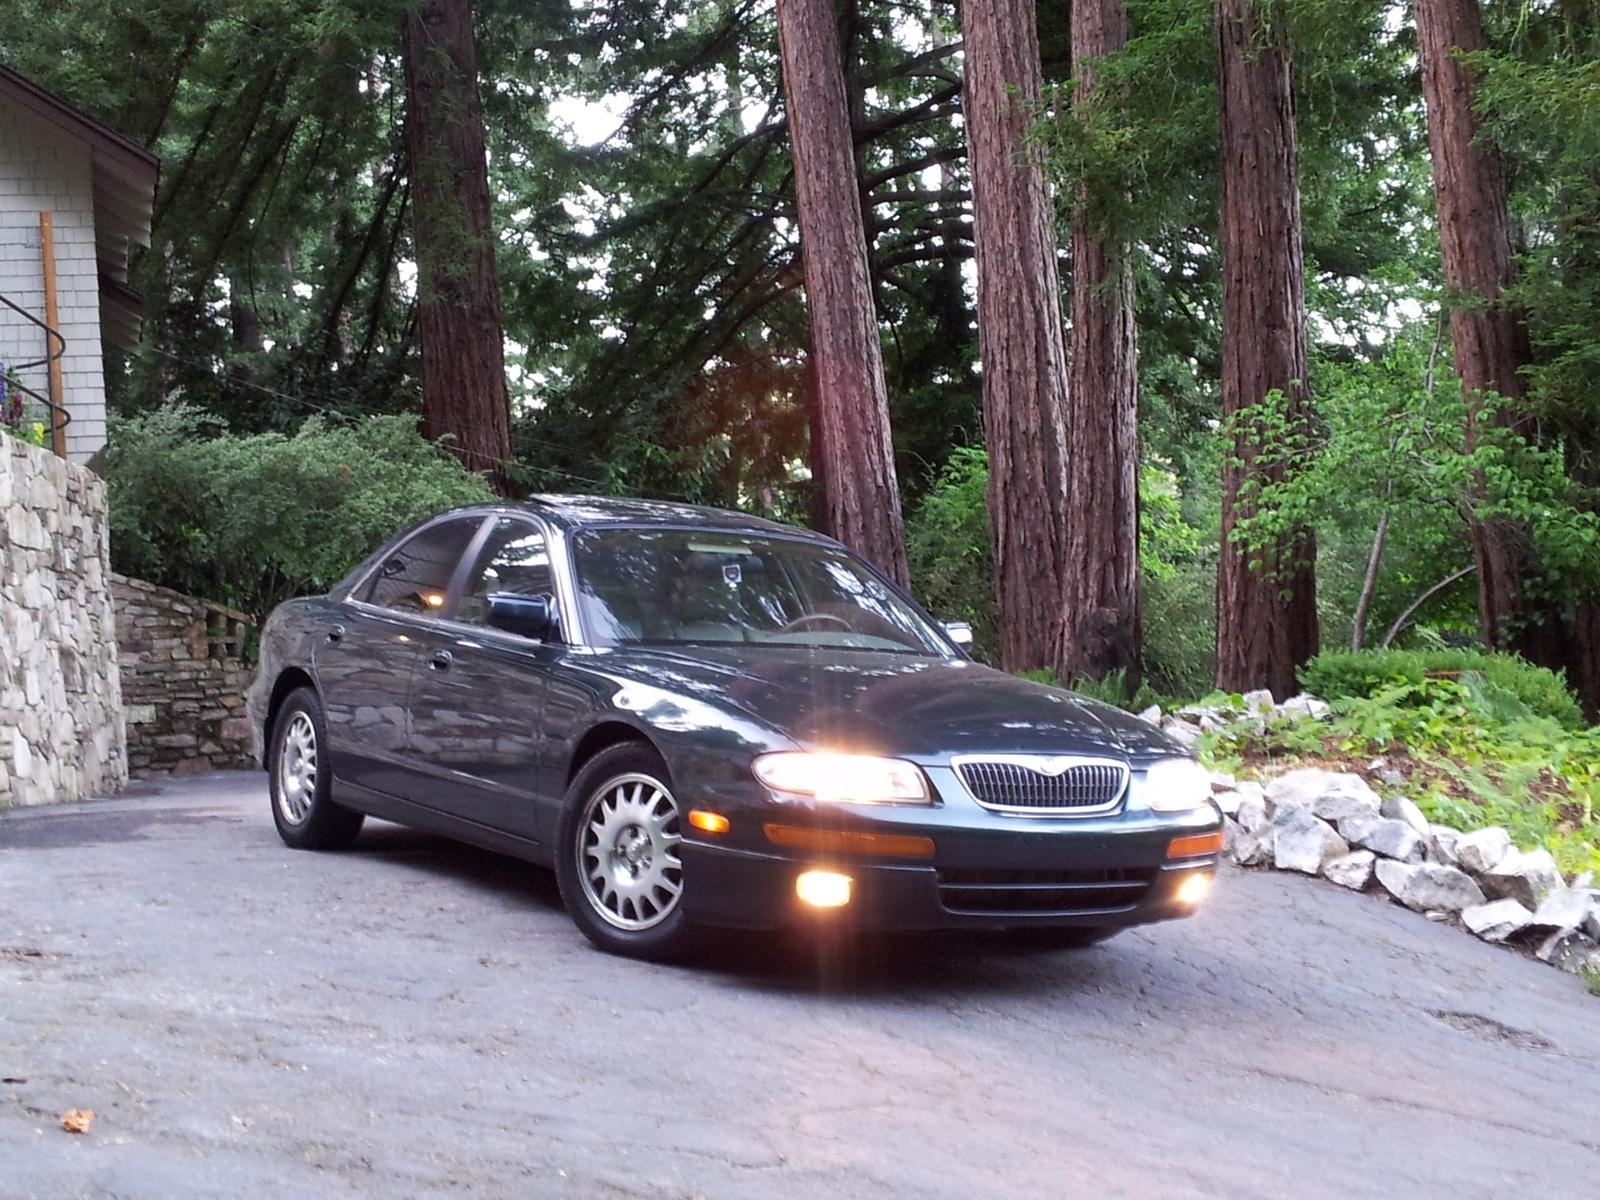 Mazda Millenia Questions - My 2002 millenia, has rough idle